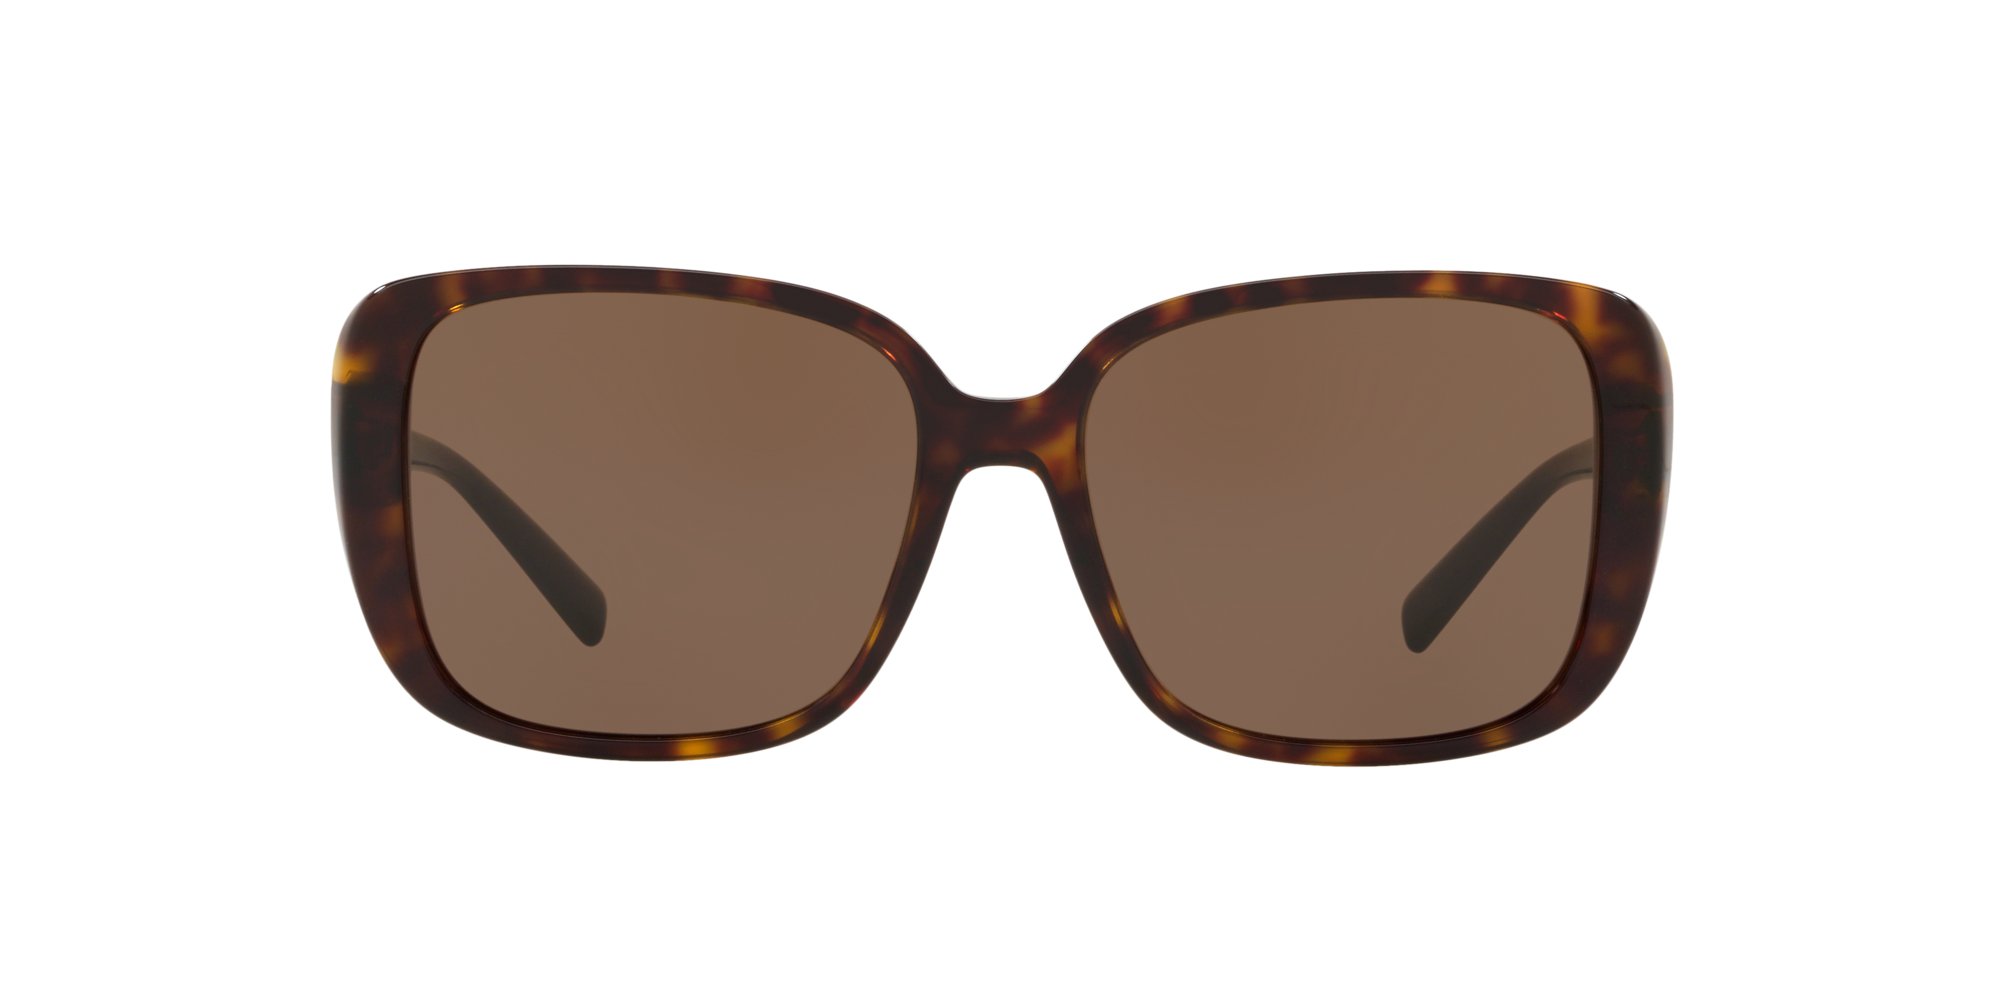 Image for VE4357 56 from LensCrafters | Glasses, Prescription Glasses Online, Eyewear